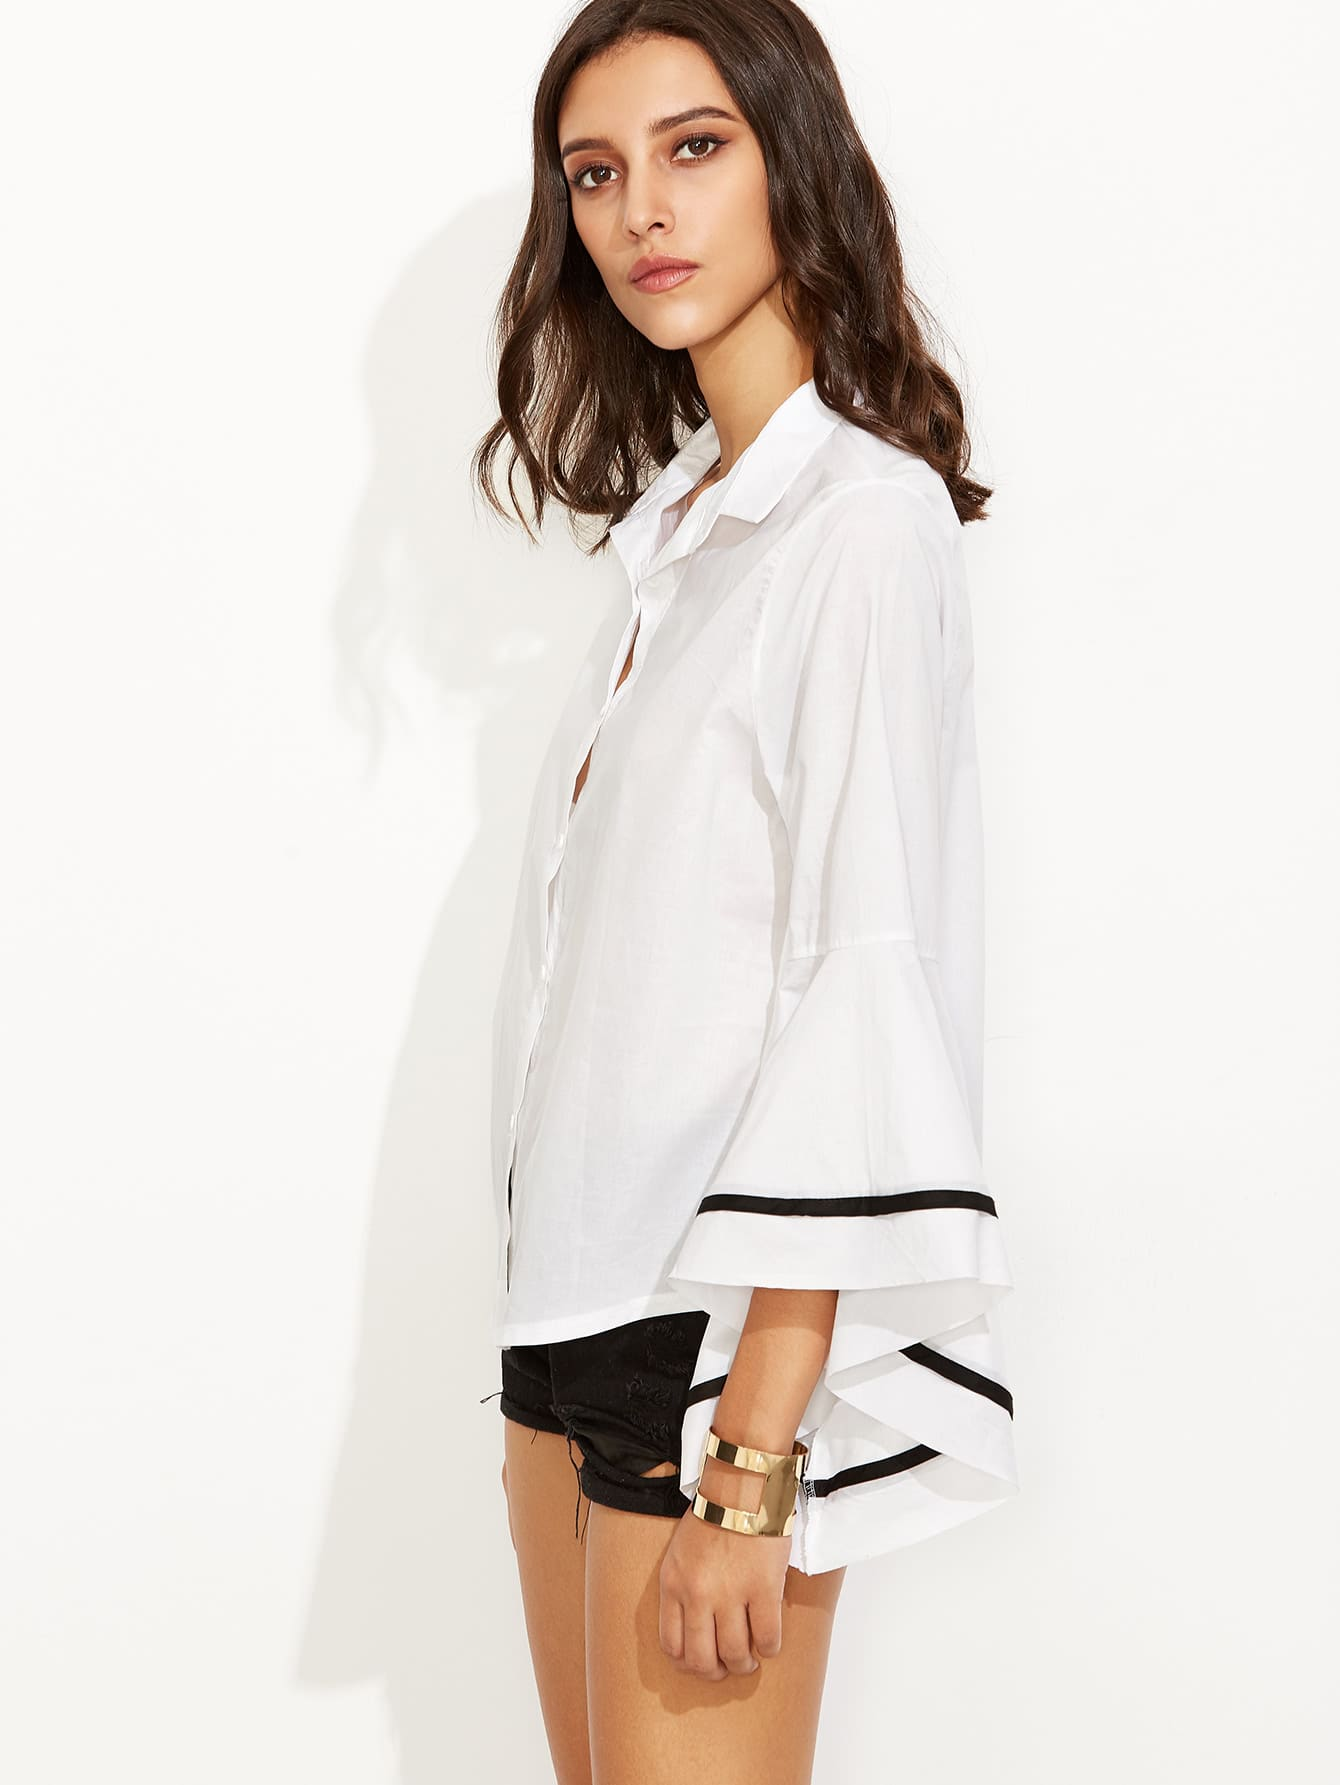 blouse160812102_2